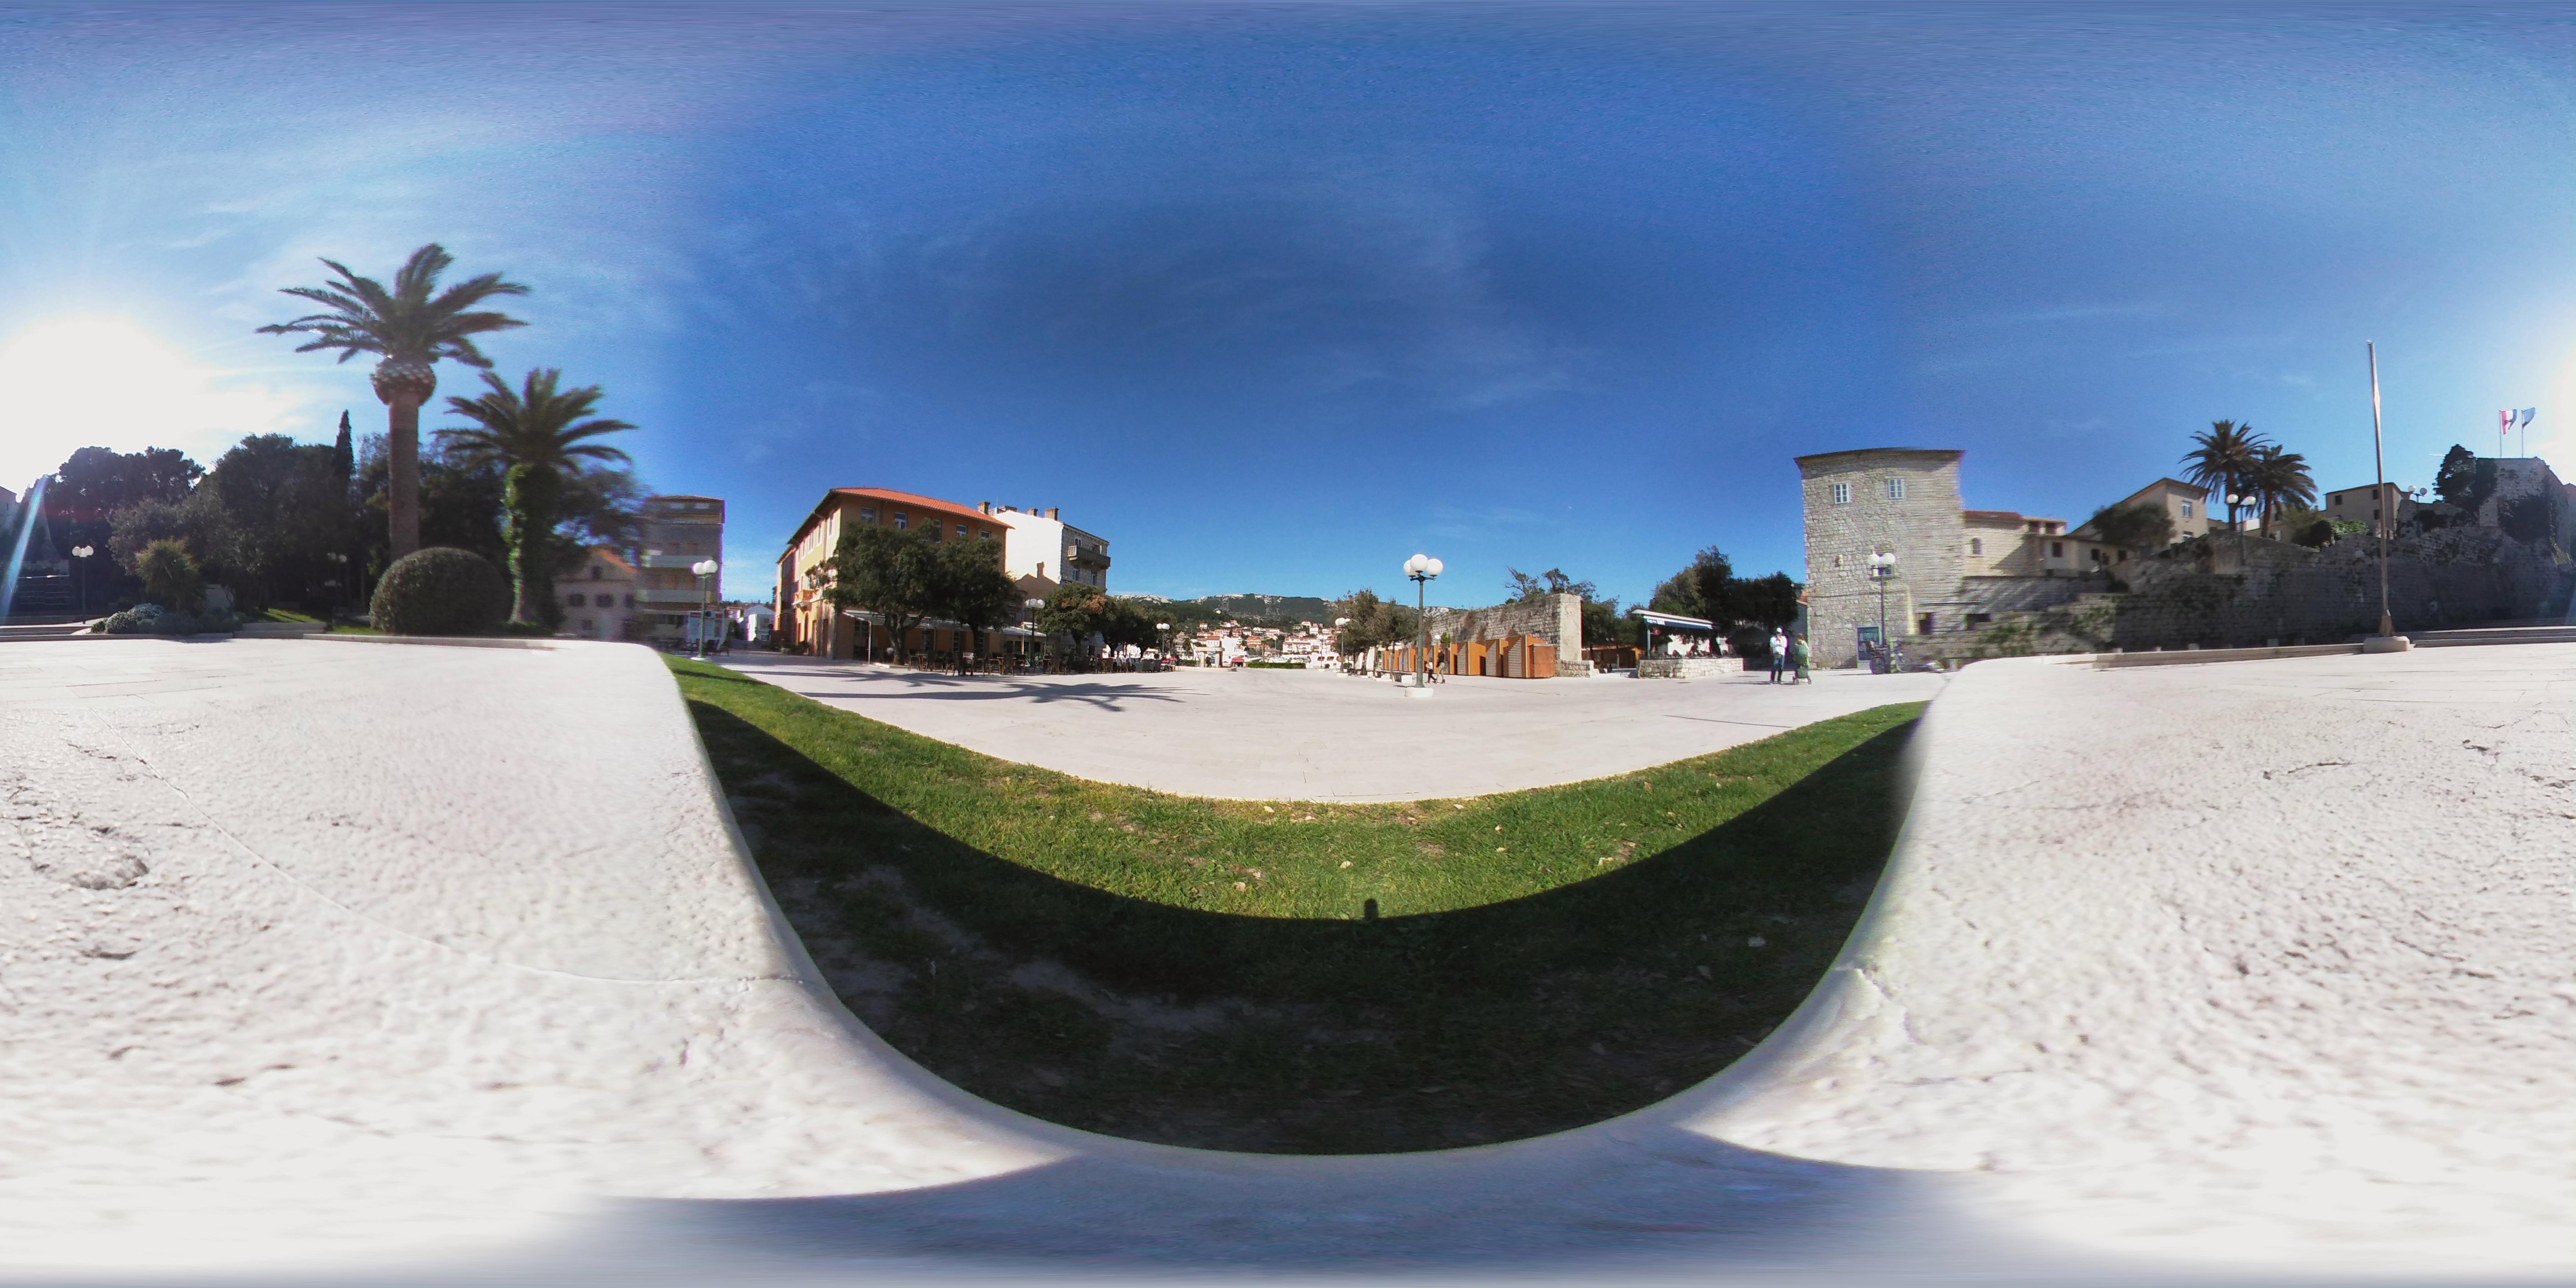 Rab's main city square, the Municipium Arba.